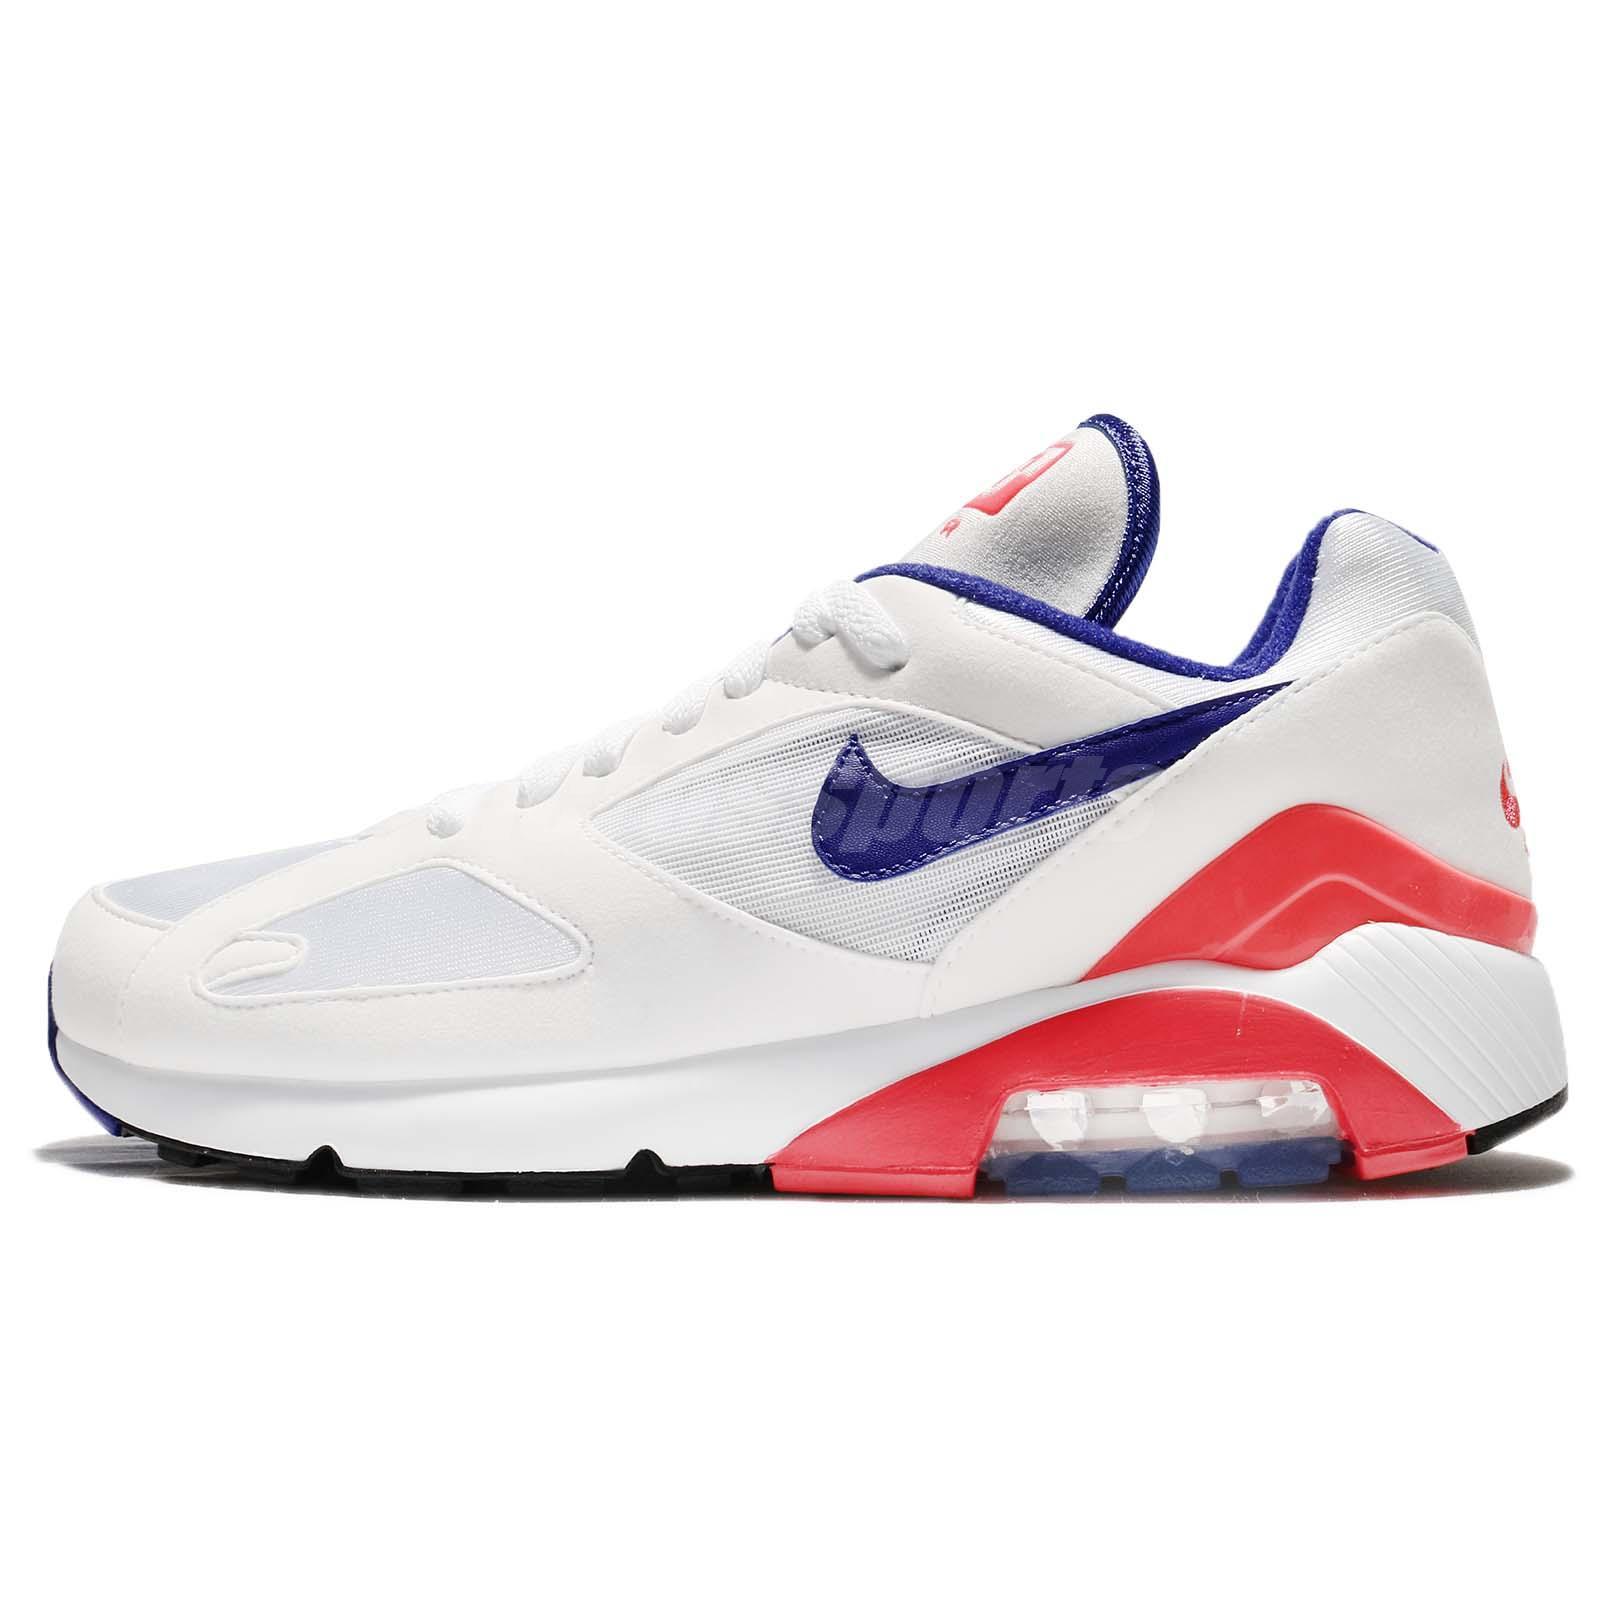 new product 8bfd5 dc0f3 Nike Air Max 180 OG Ultramarine Pack White Solar Red Men Running Shoe  615287-100